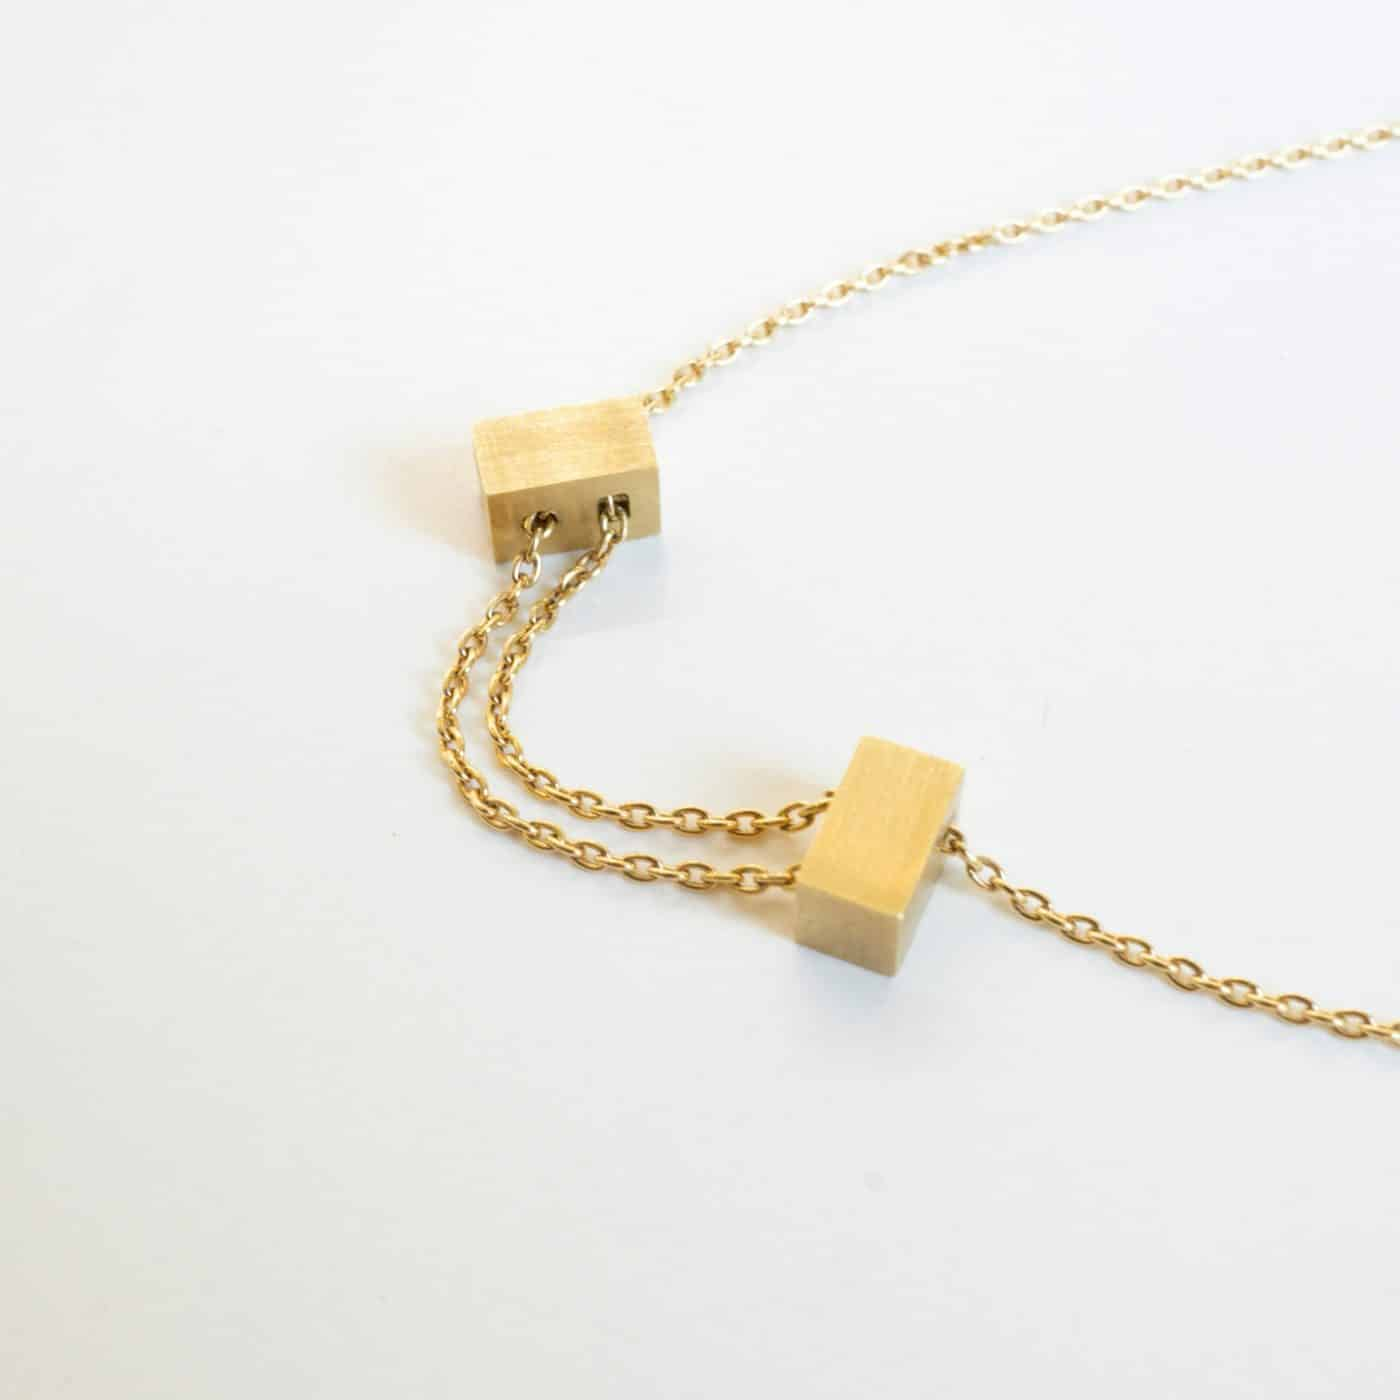 18 Karat Yellow Gold Adjustable Cube Necklace